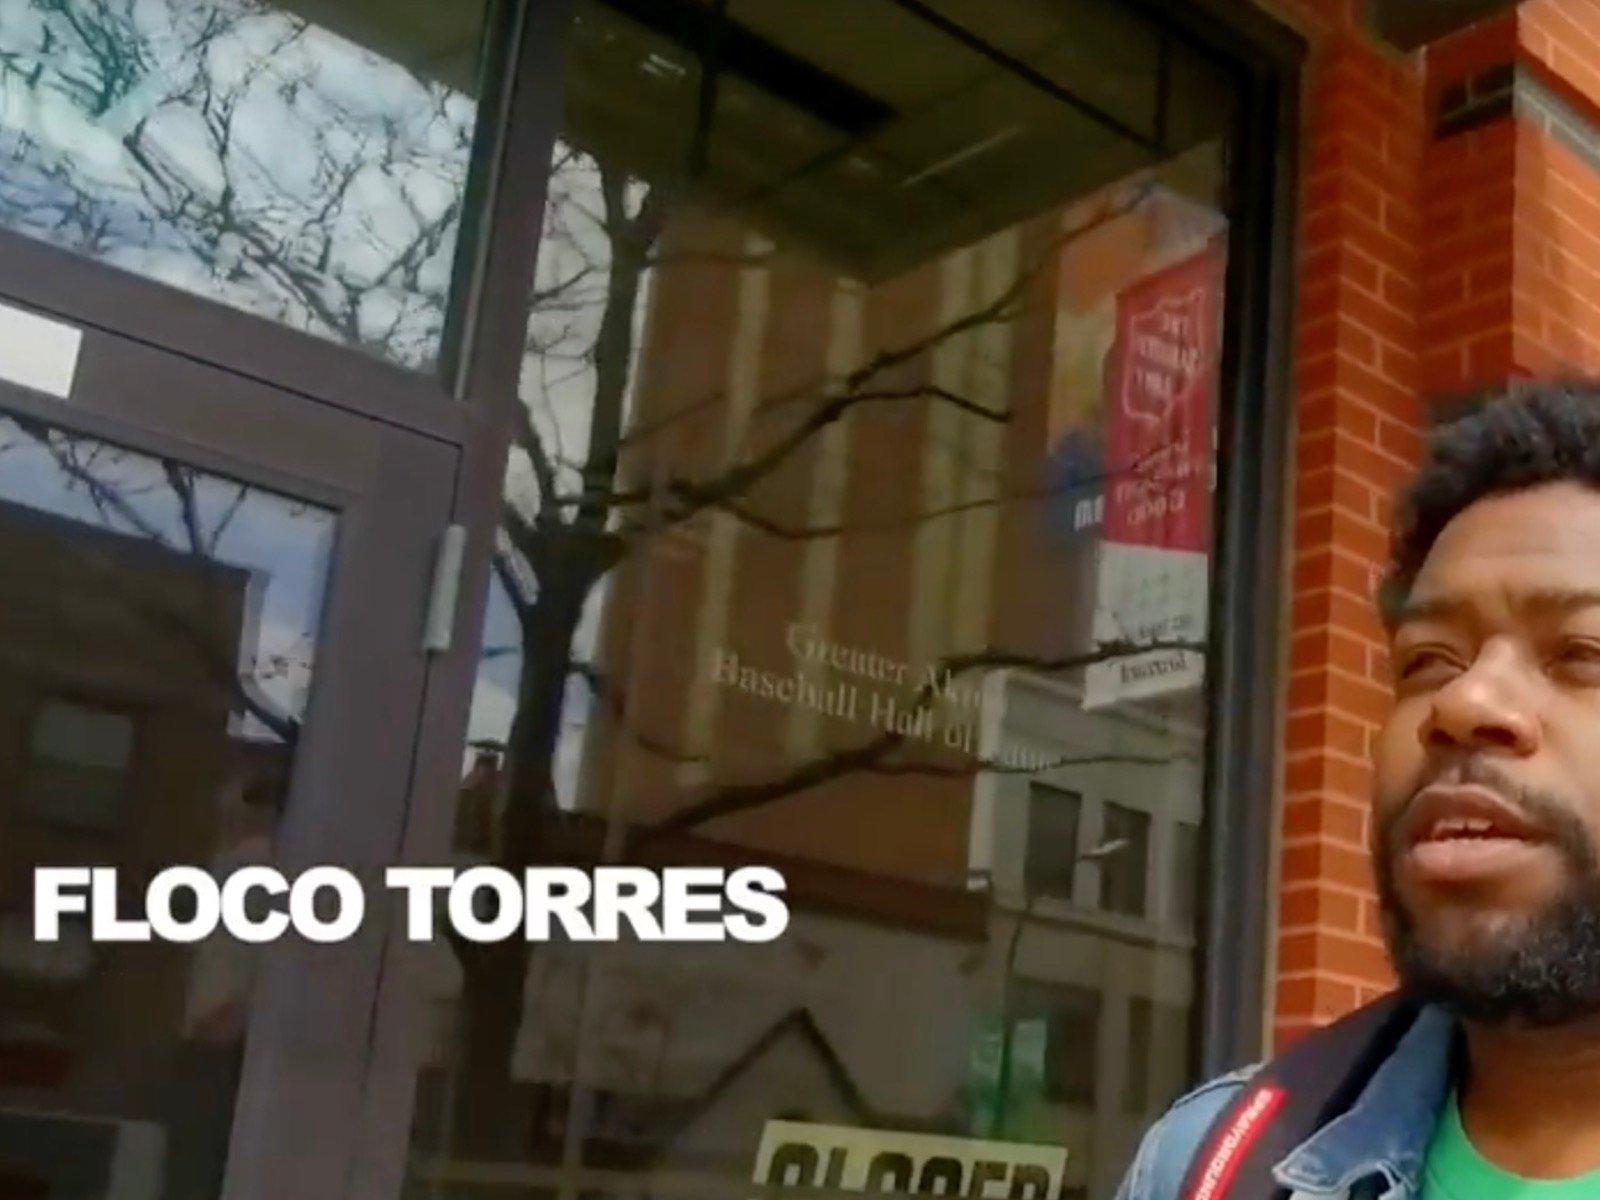 Floco Torres